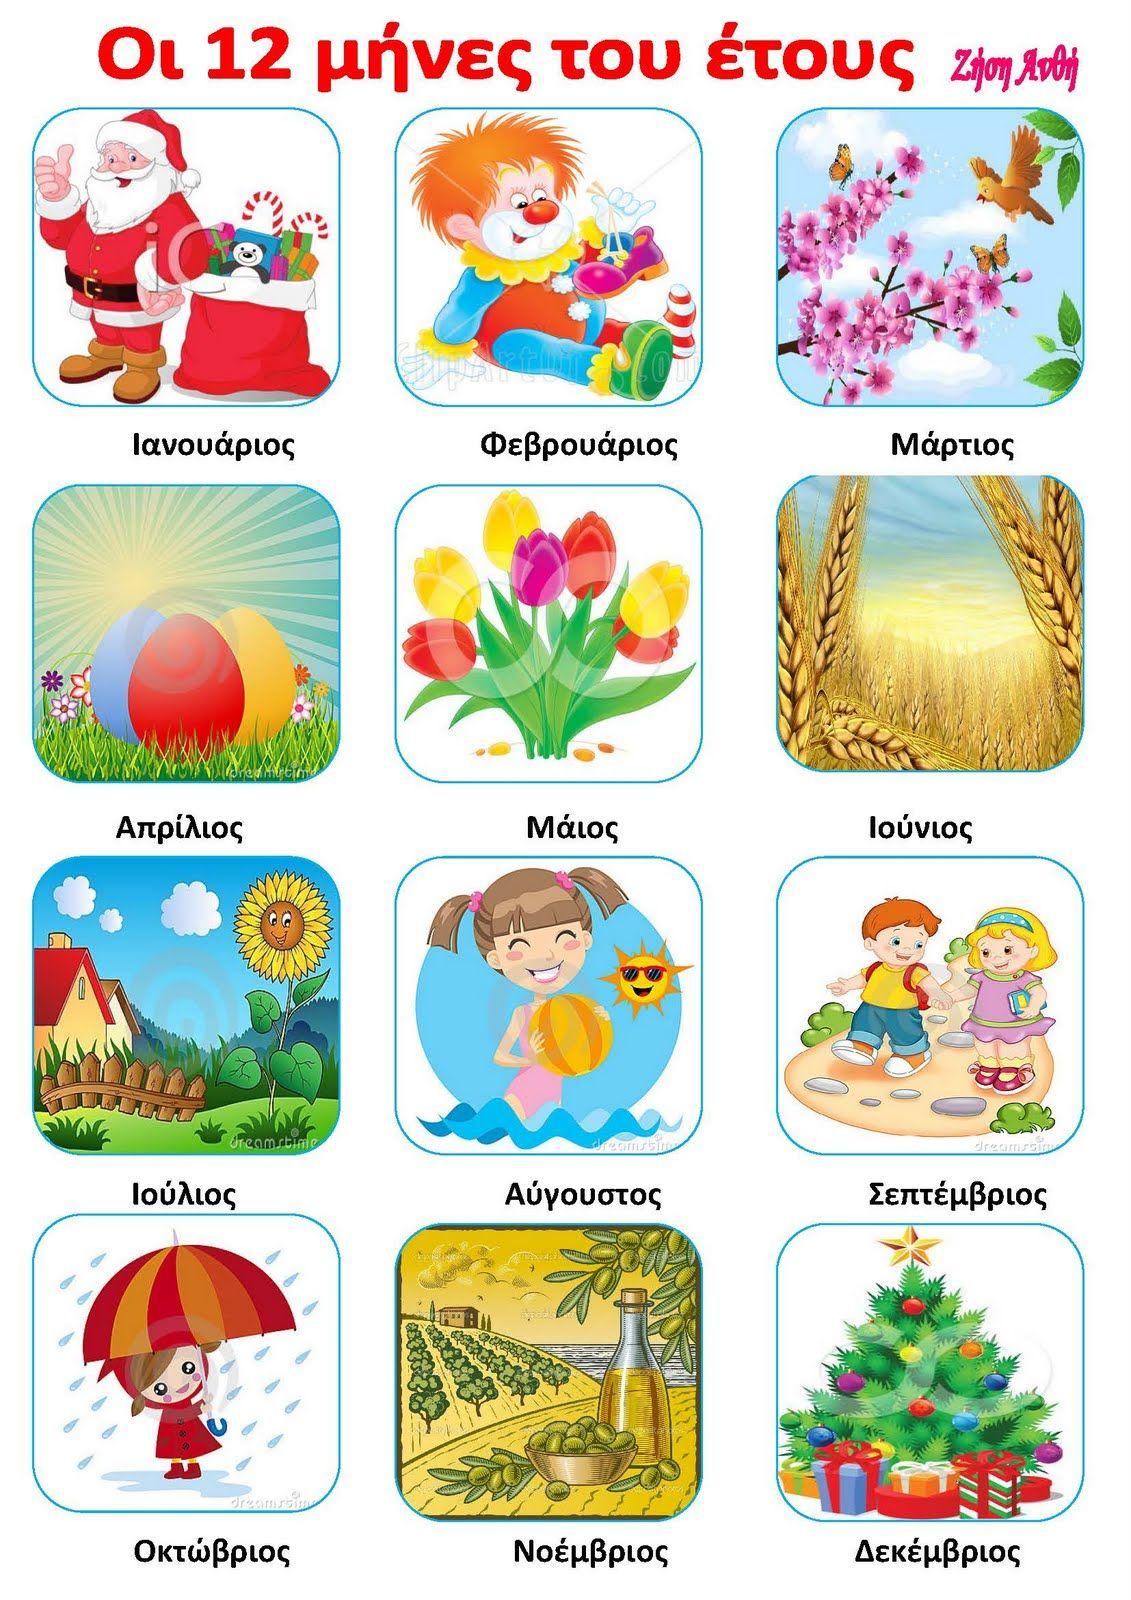 dreamskindergarten Το νηπιαγωγείο που ονειρεύομαι !: Λίστα αναφοράς και καρτέλες για τους μήνες του έτους